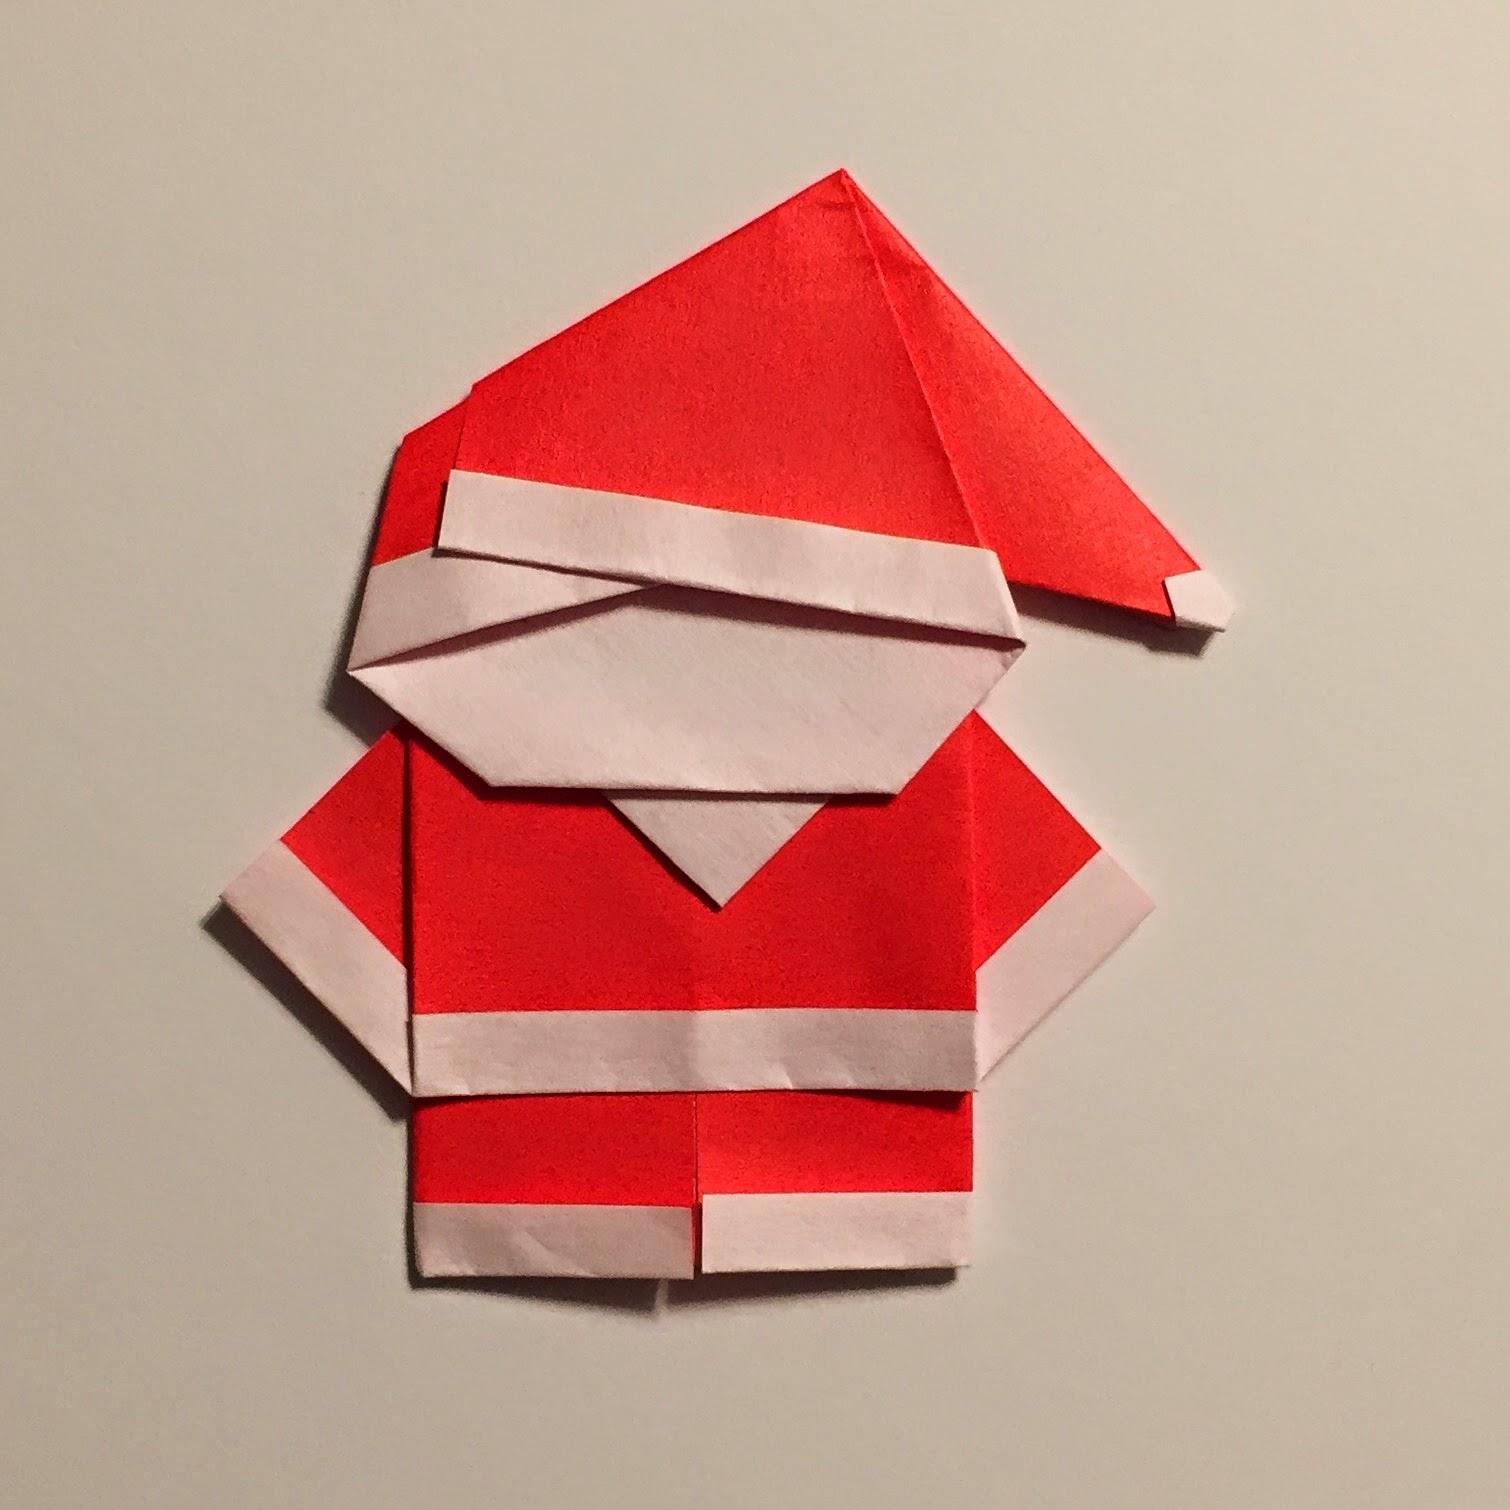 mr washisan santa claus de origami. Black Bedroom Furniture Sets. Home Design Ideas